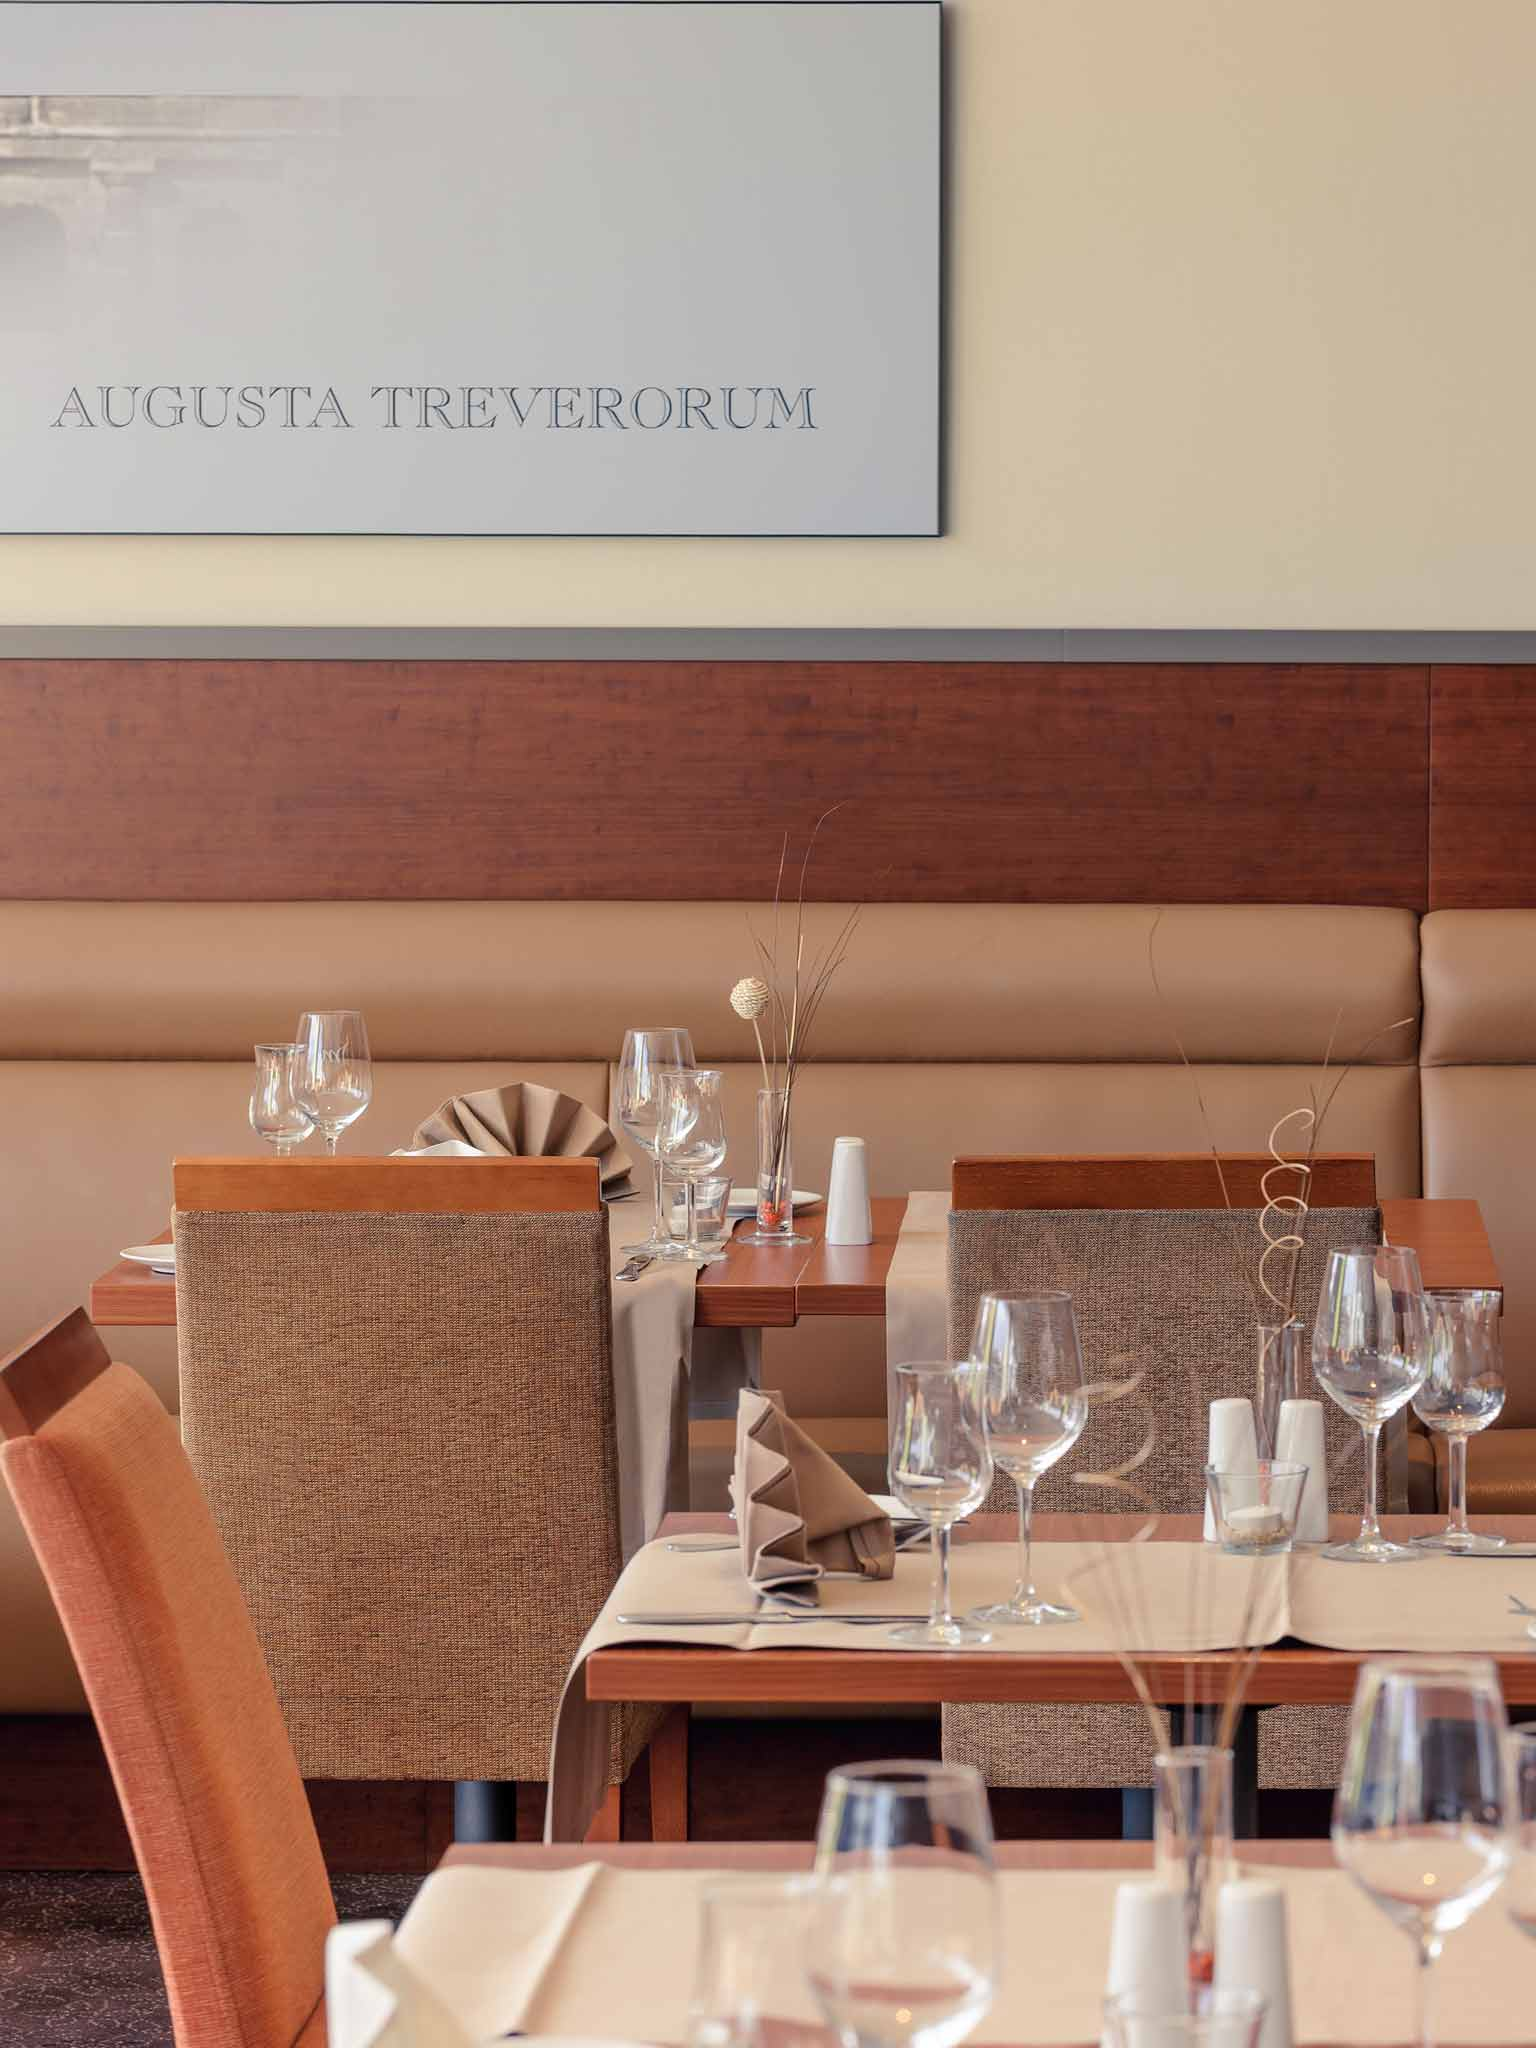 Mercure Hotel Trier Porta Nigra 餐饮设施